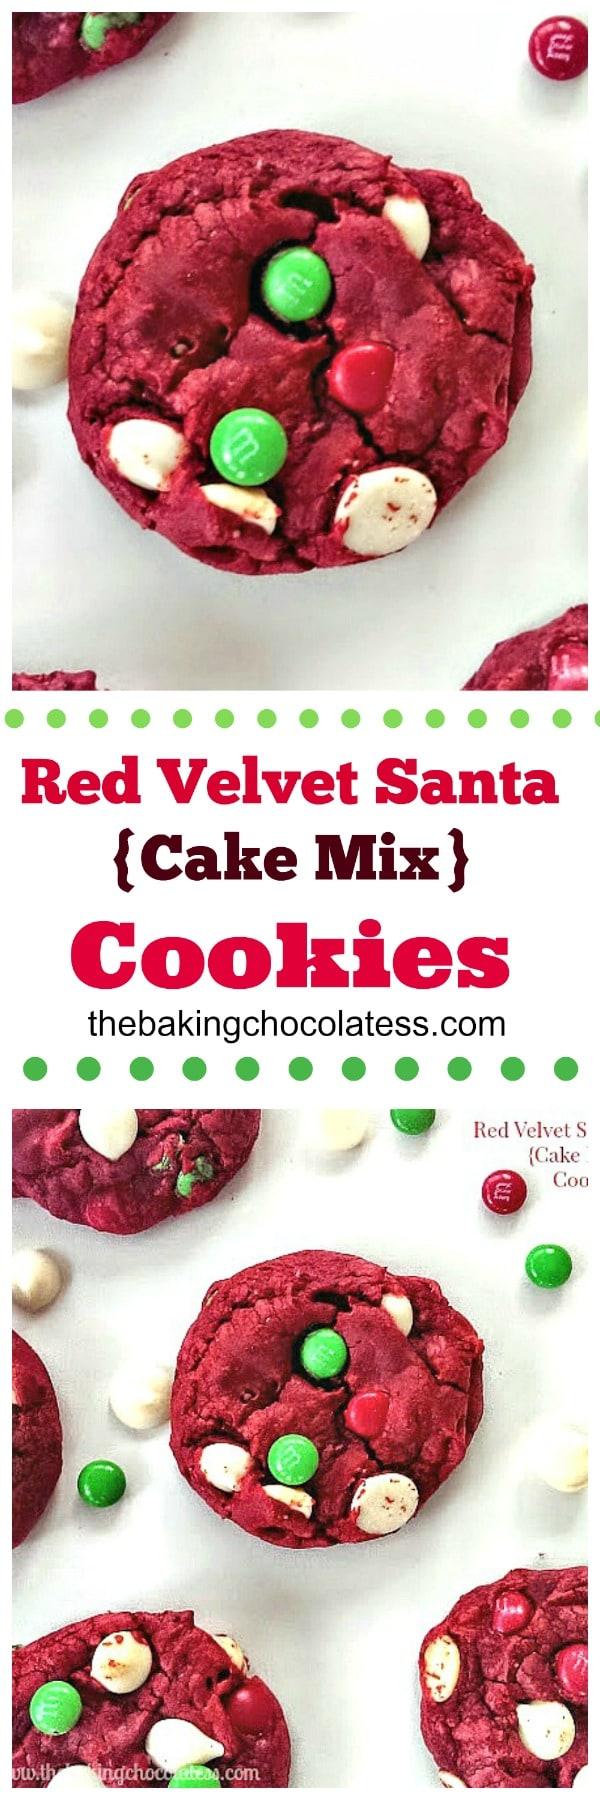 Red Velvet Santa {Cake Mix} Cookies #cookies #holiday #santa #cakemix